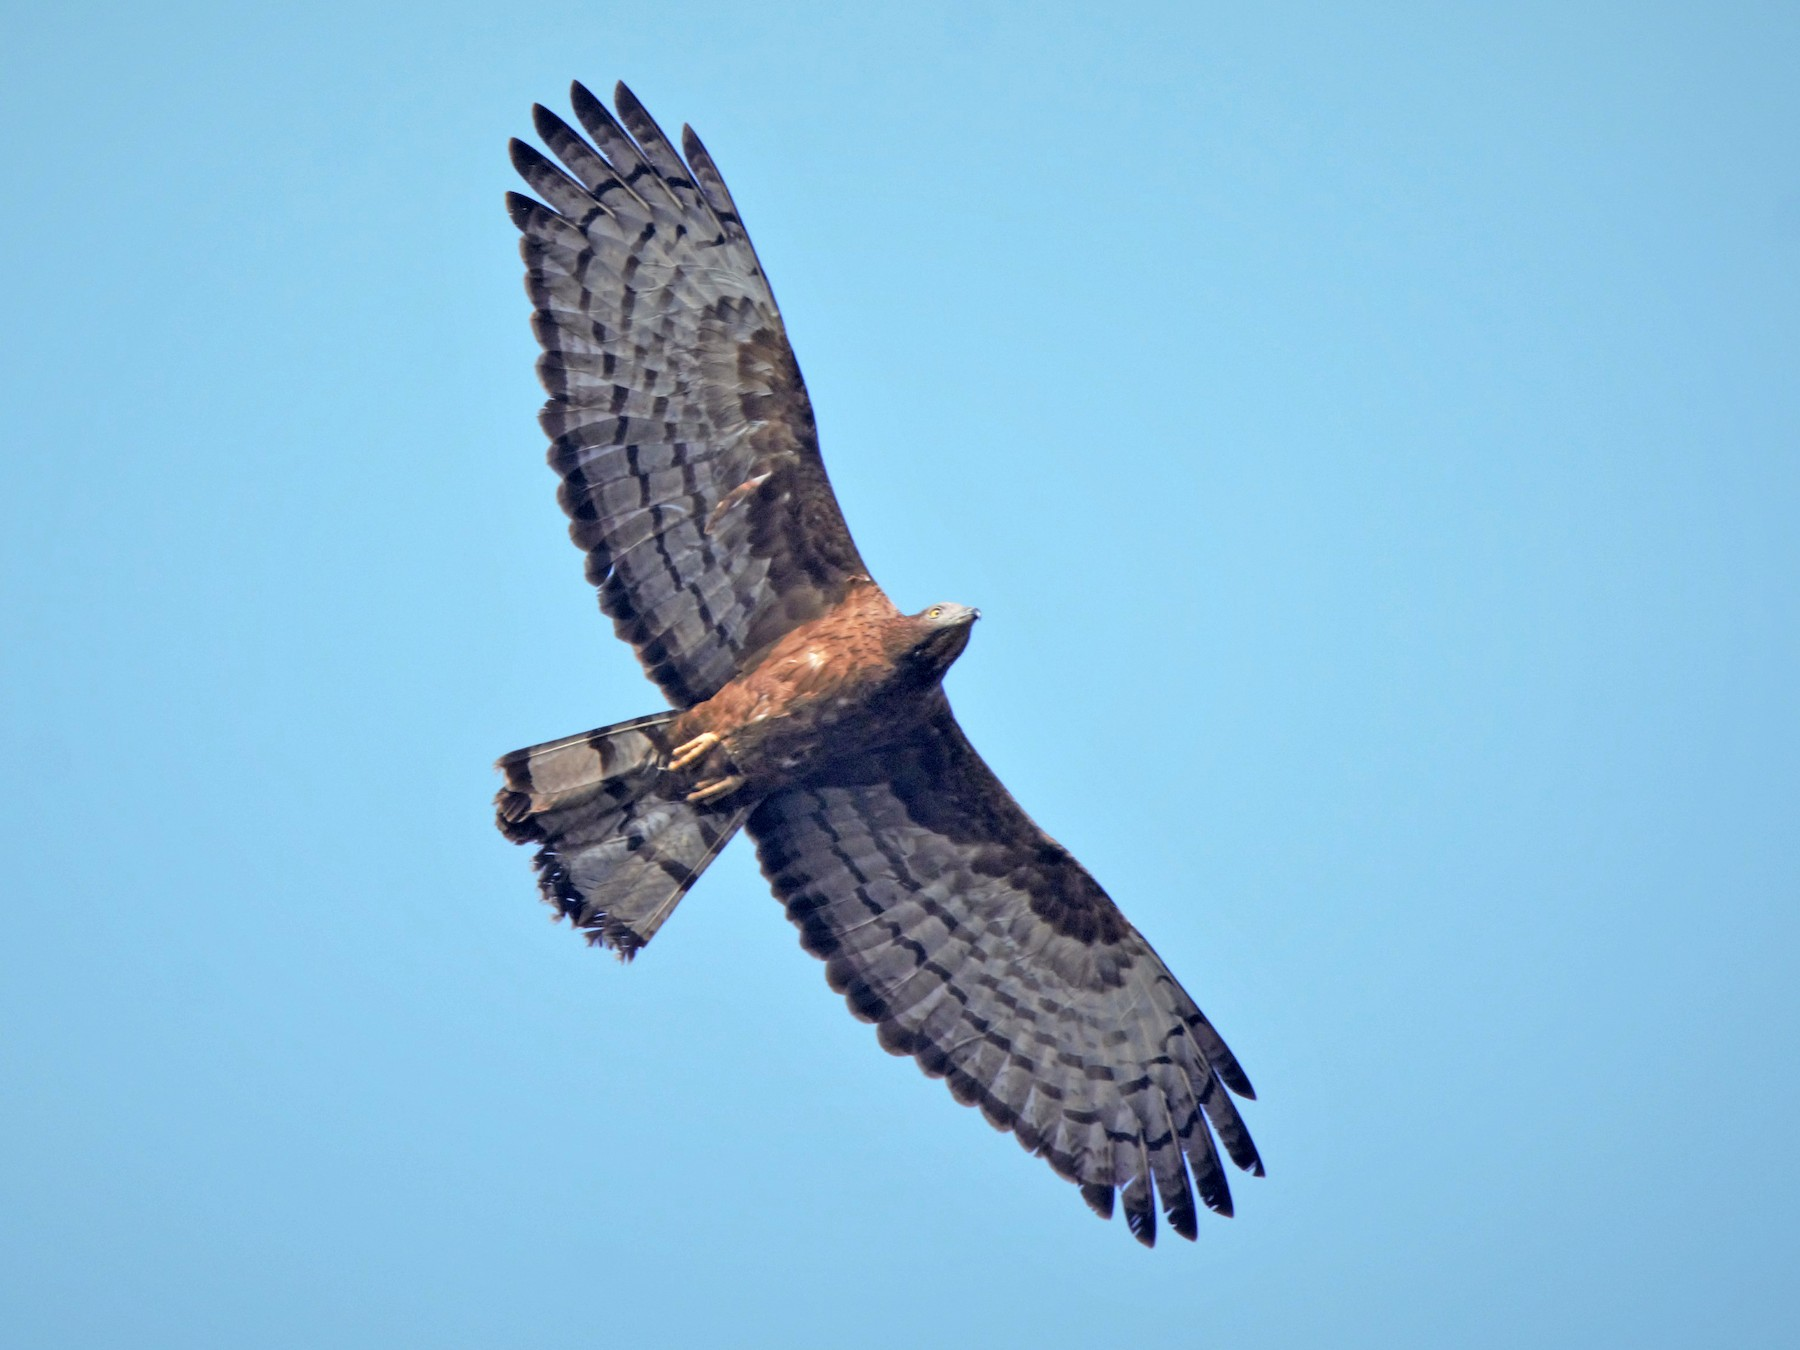 Oriental Honey-buzzard - Prem Prakash Garg